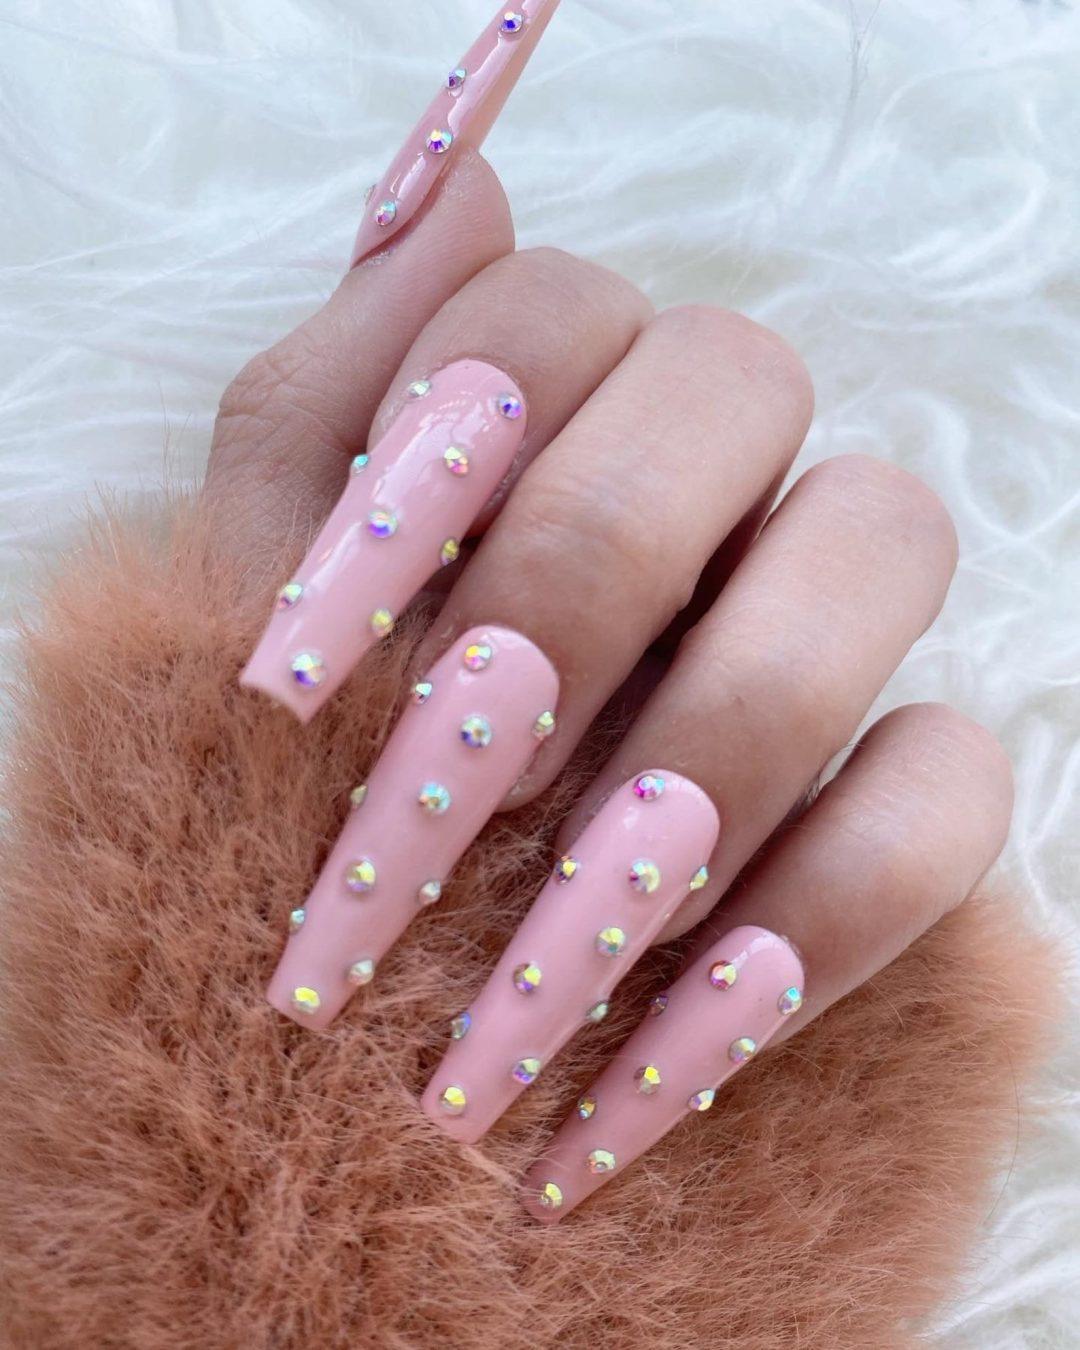 Soft pink rhinestone nails